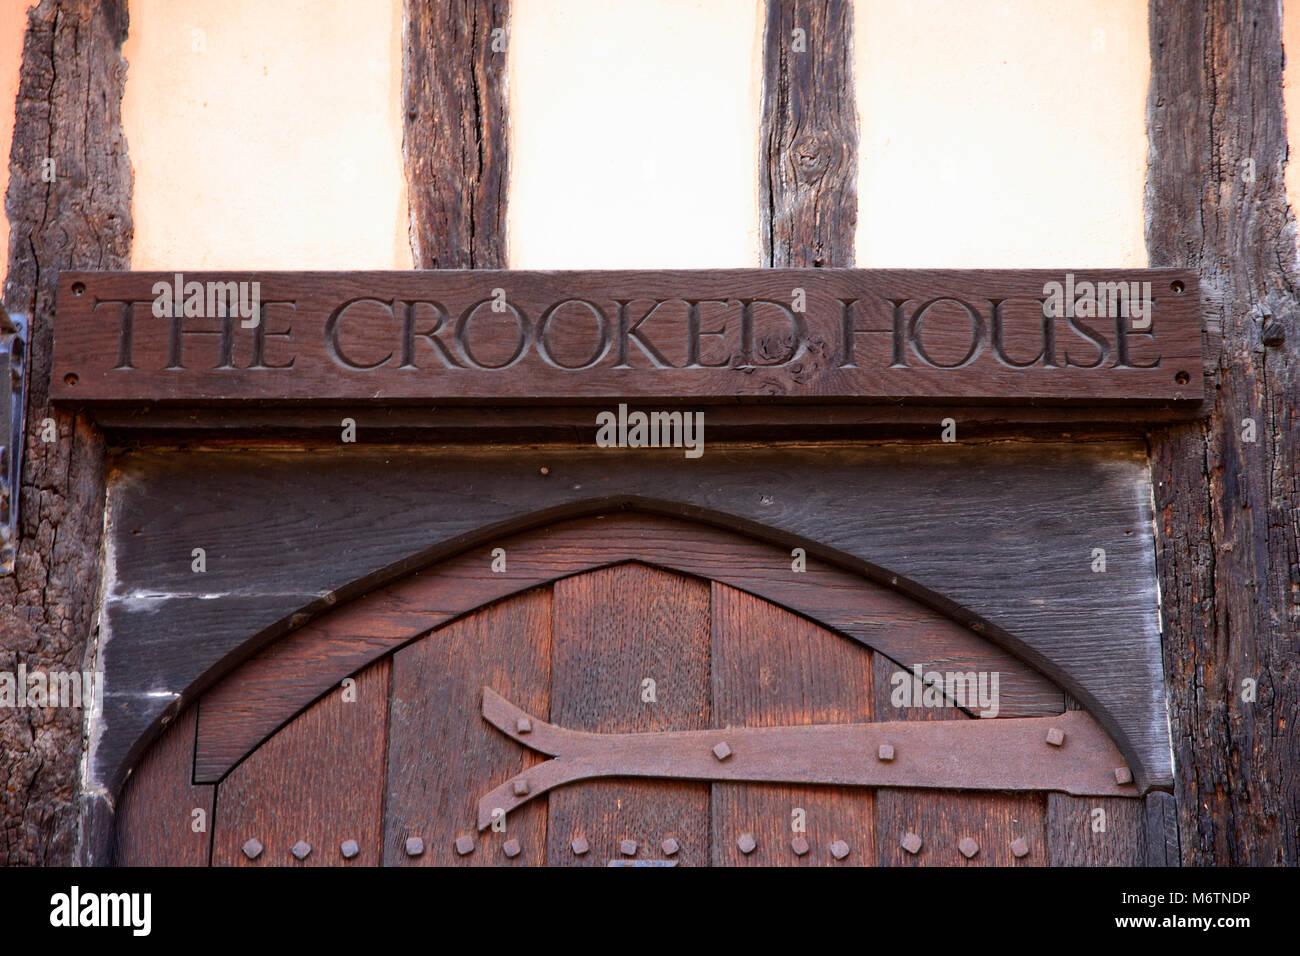 The Crooked House, Lavenham village, Suffolk County, England, UK - Stock Image